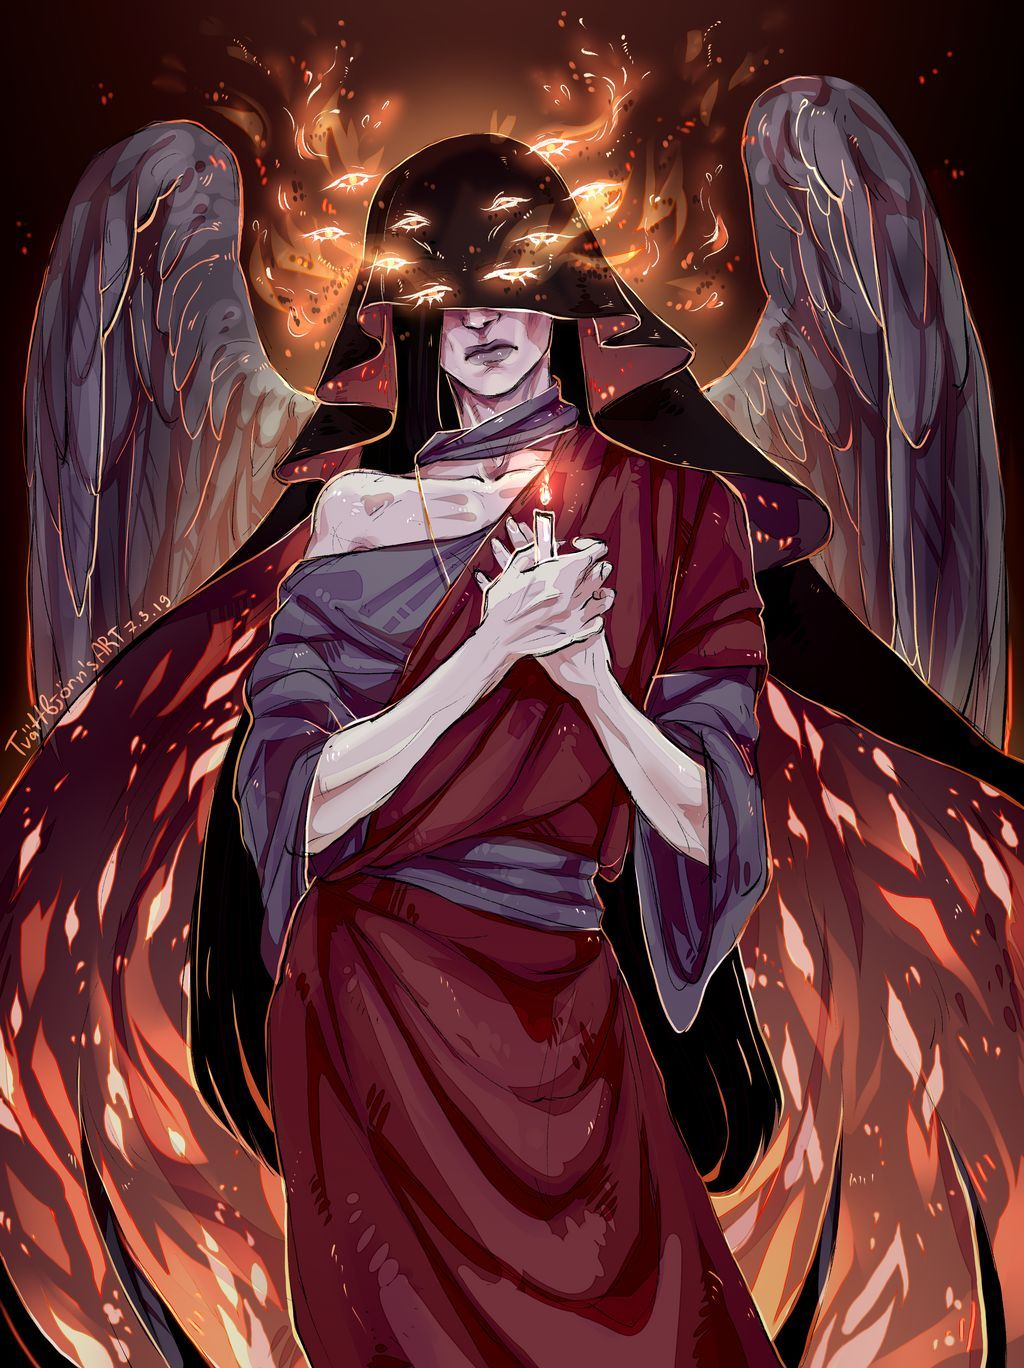 Pin by Jayden Platt on Mythology in 2020 Archangel